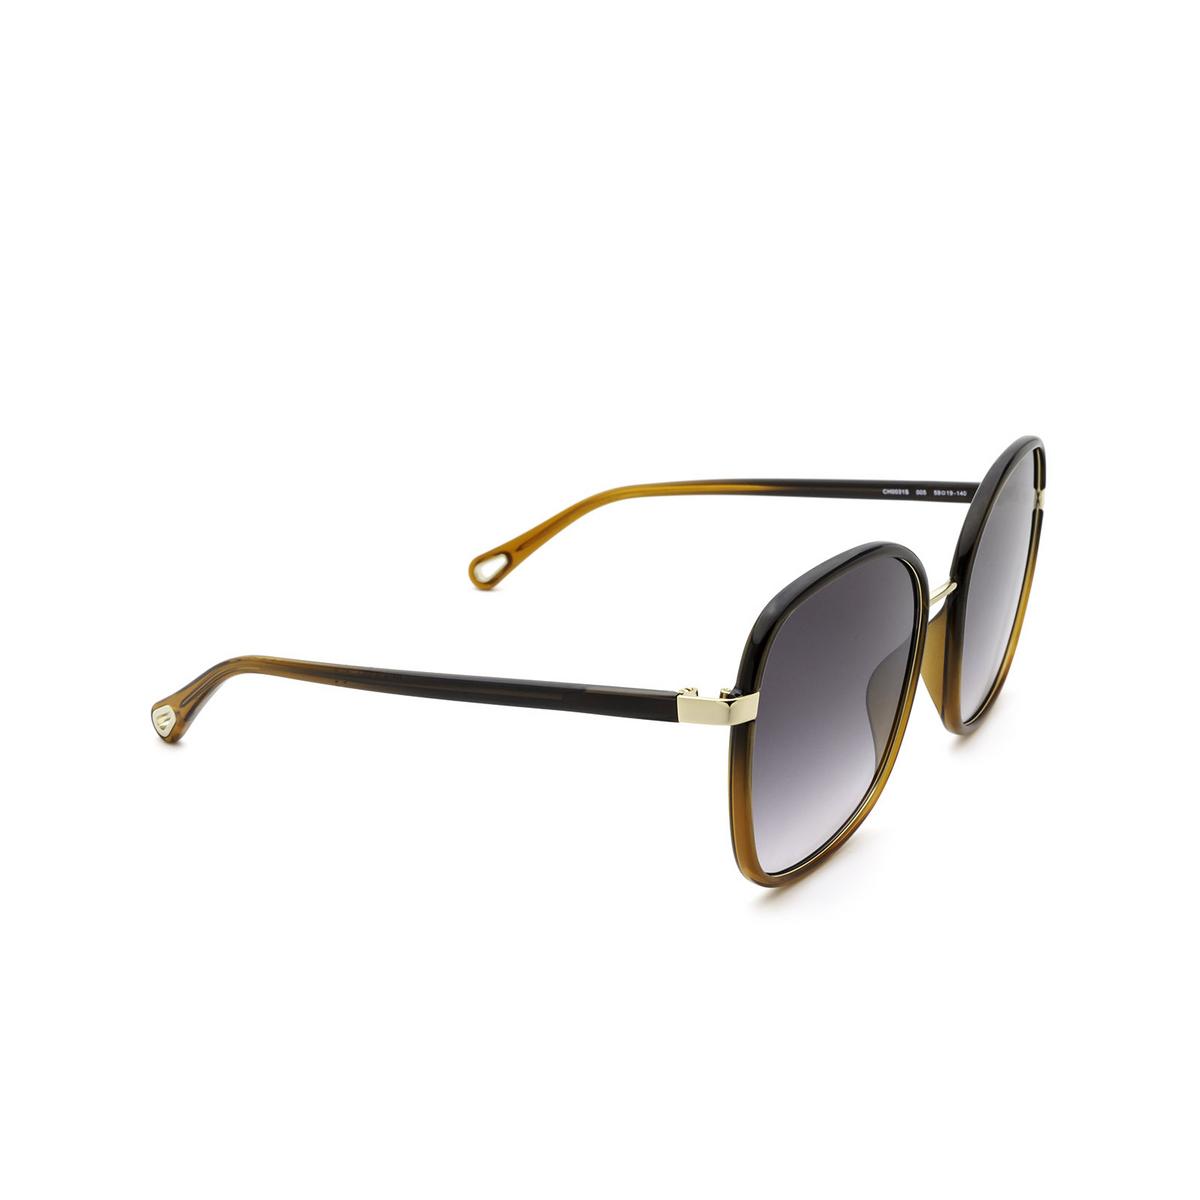 Chloé® Square Sunglasses: CH0031S color Black 005 - three-quarters view.